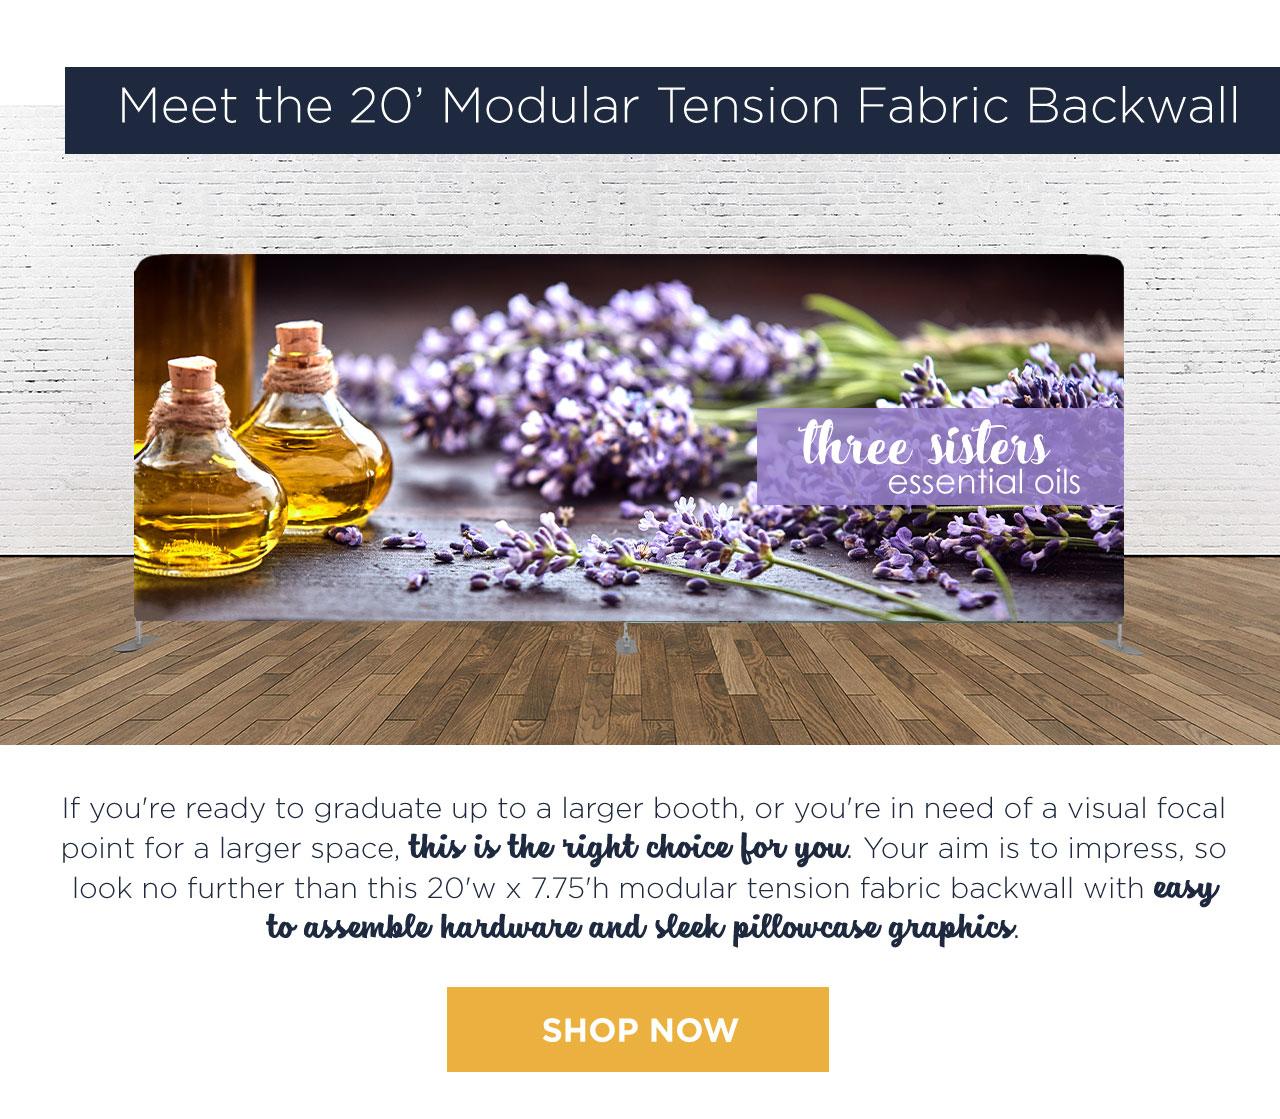 Meet the 20' Modular Tension Fabric Backwall - SHOP NOW